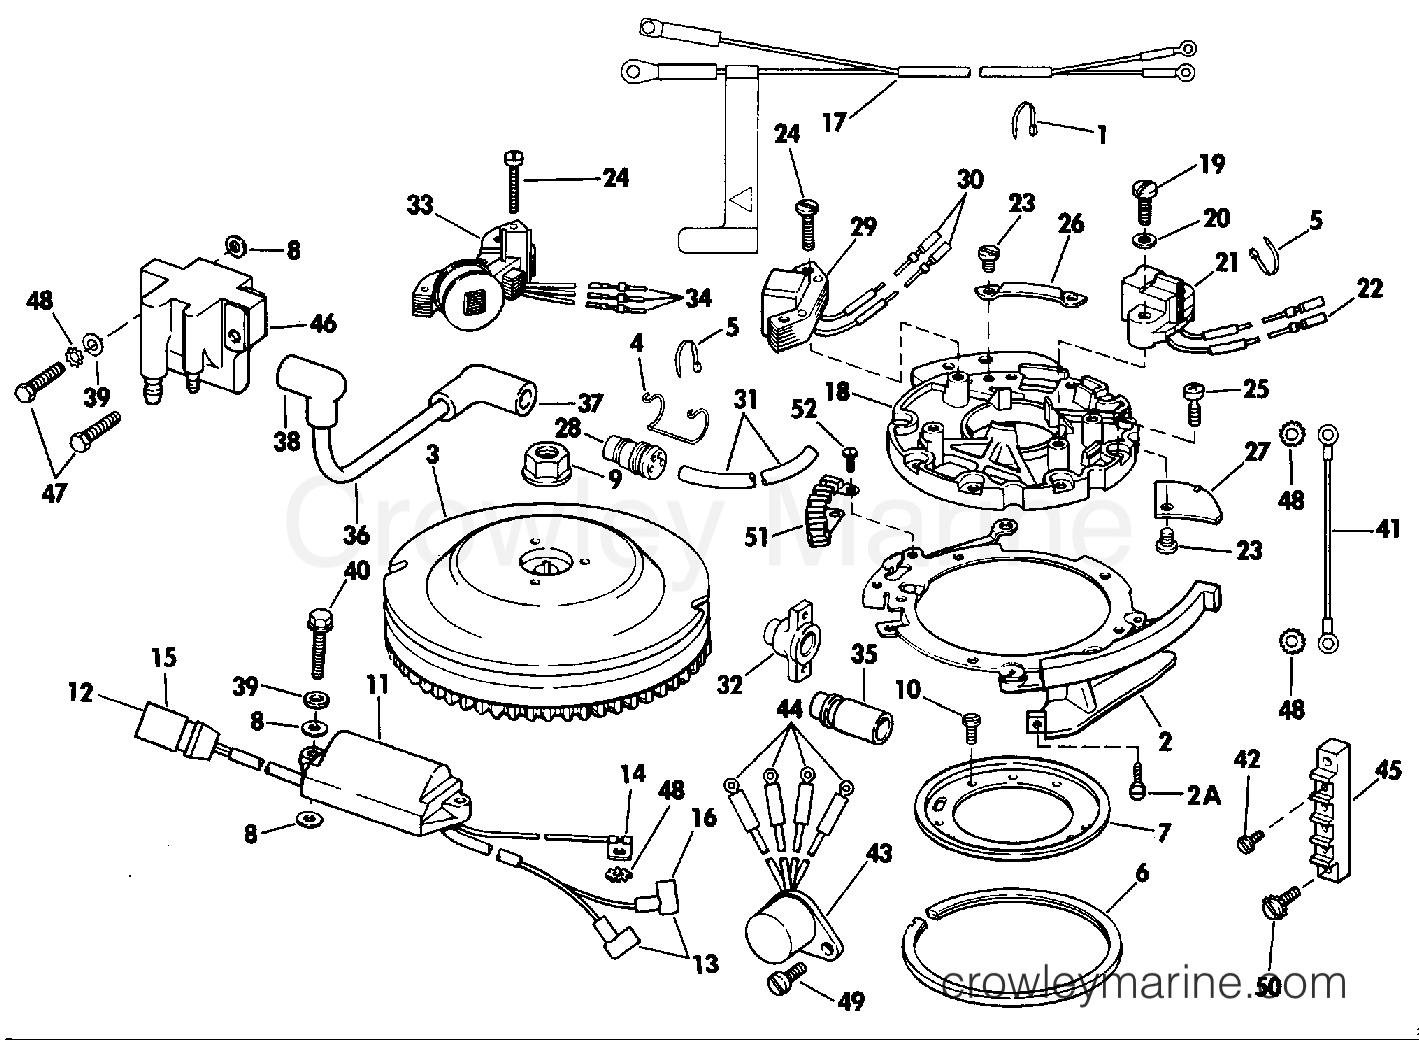 tags: #mercury ignition wiring diagram#mercury outboard tilt wiring diagram#1978  mercury outboard wiring diagram#old mercury outboard parts diagram#mercury